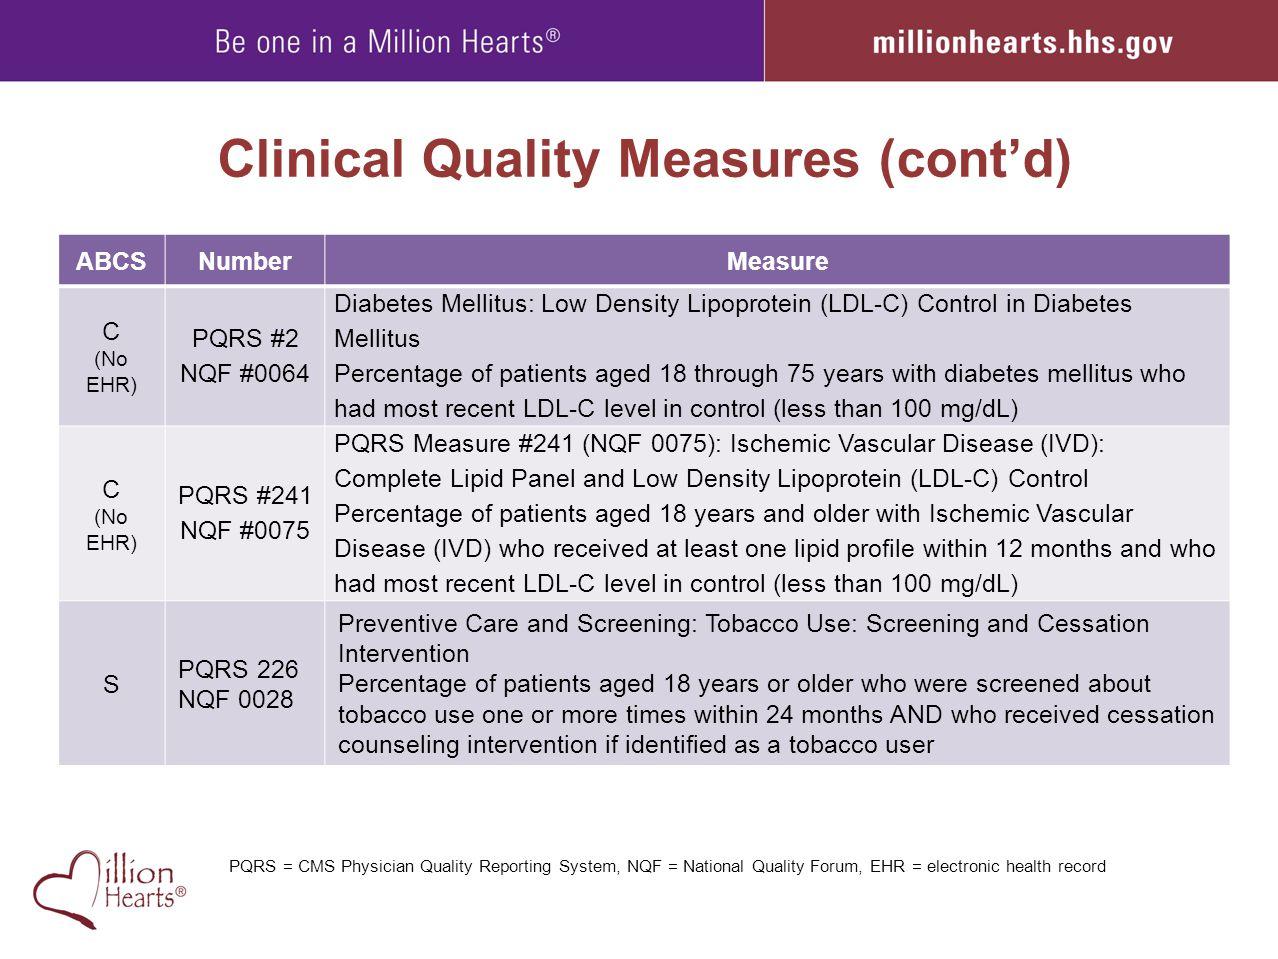 Clinical Quality Measures (cont'd)